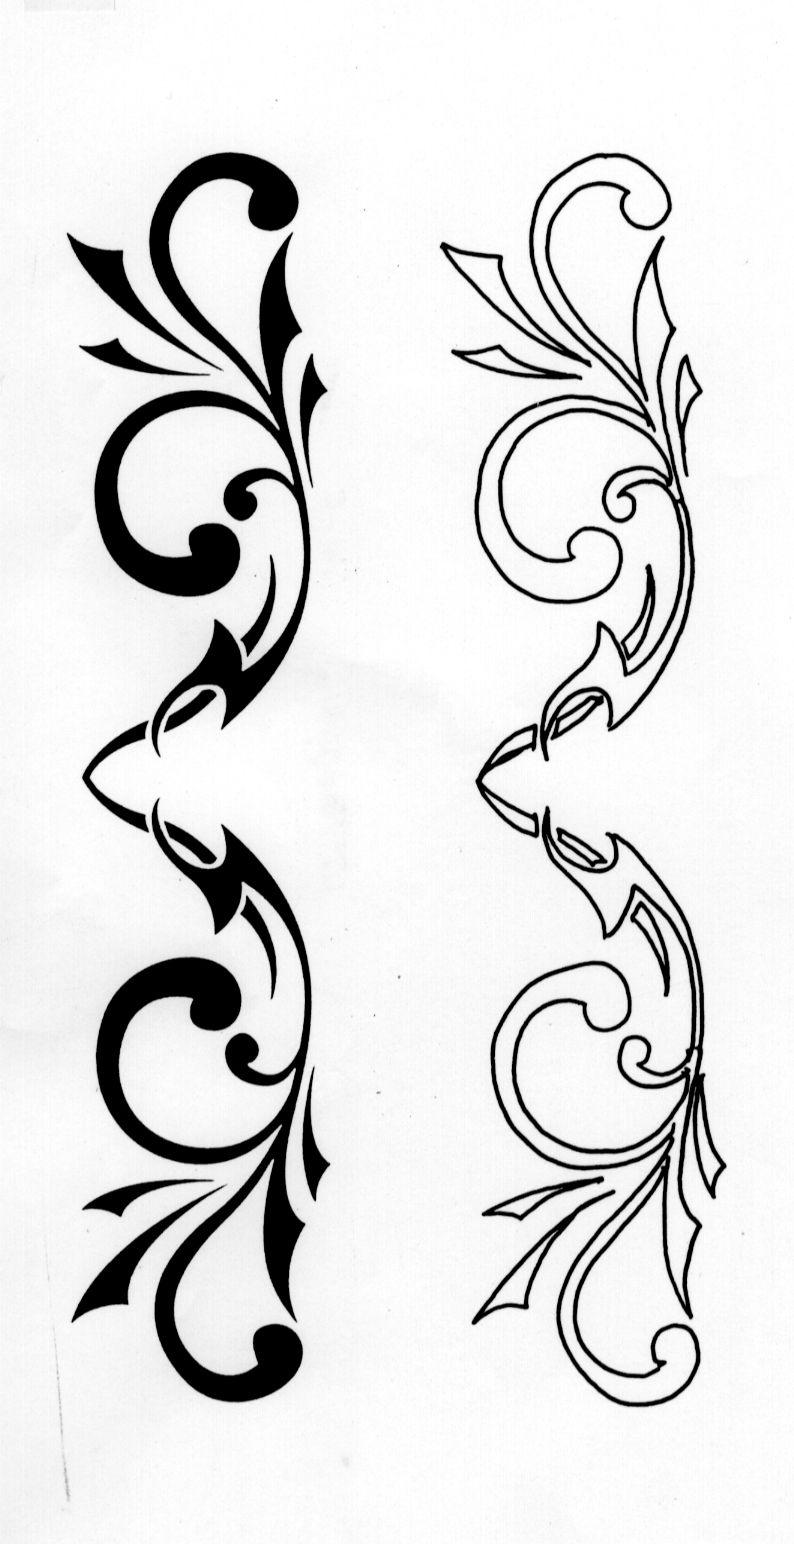 Pin by Lisa Bledsoe on Body art | Pinterest | Bordado, Tatuajes and ...